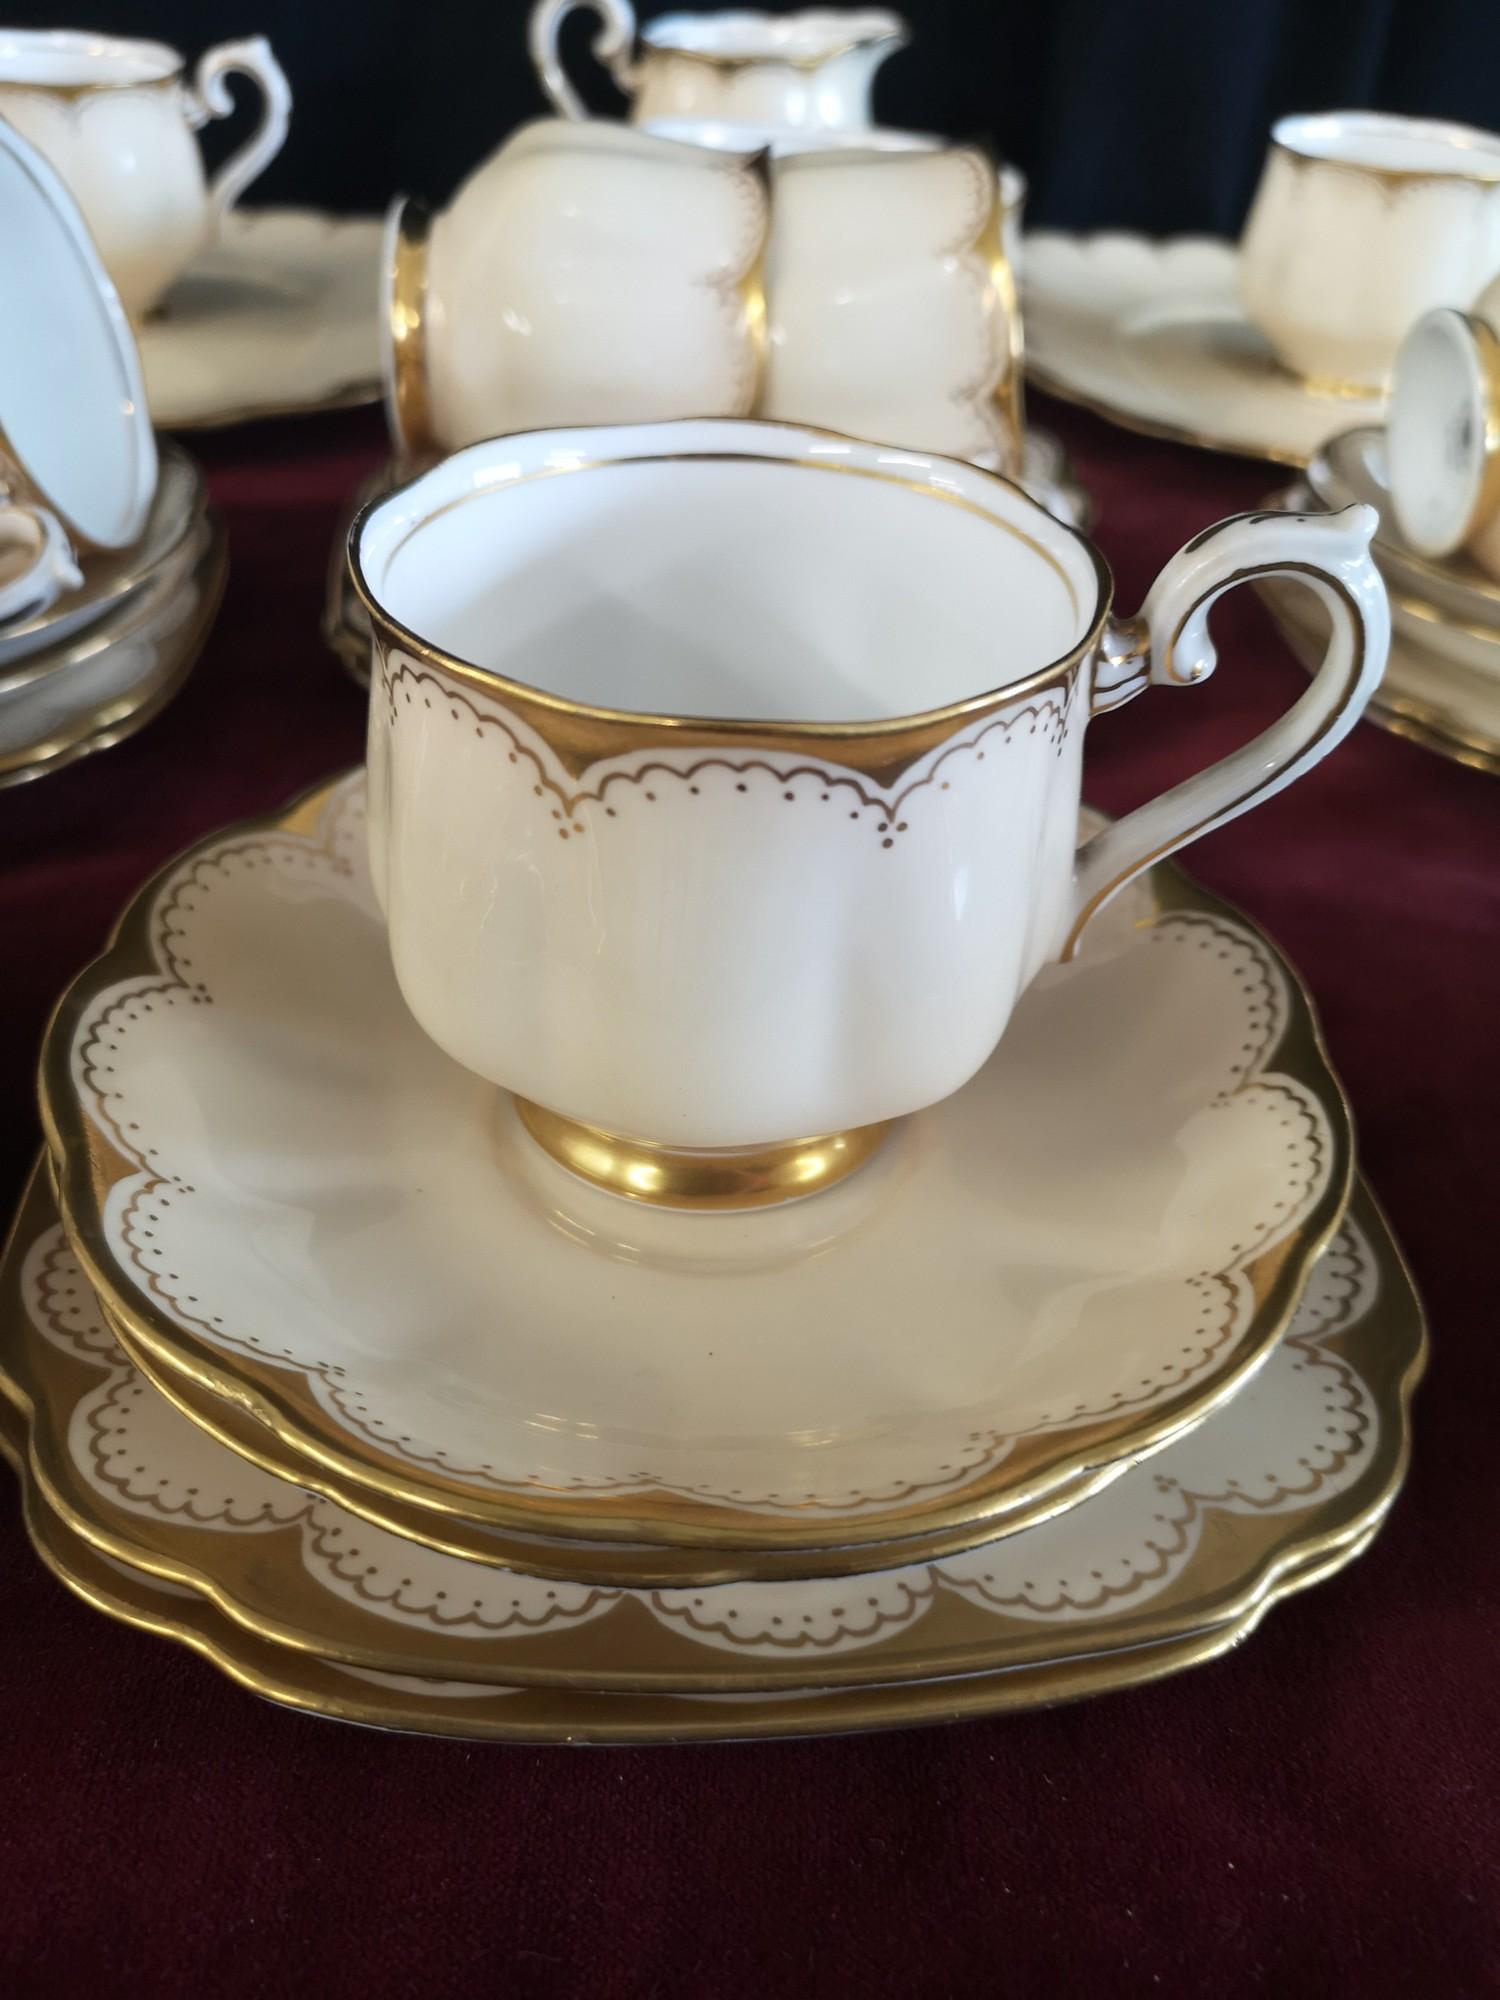 Large 1900s Royal Albert gilt tea set, set in cream back ground. - Image 9 of 10